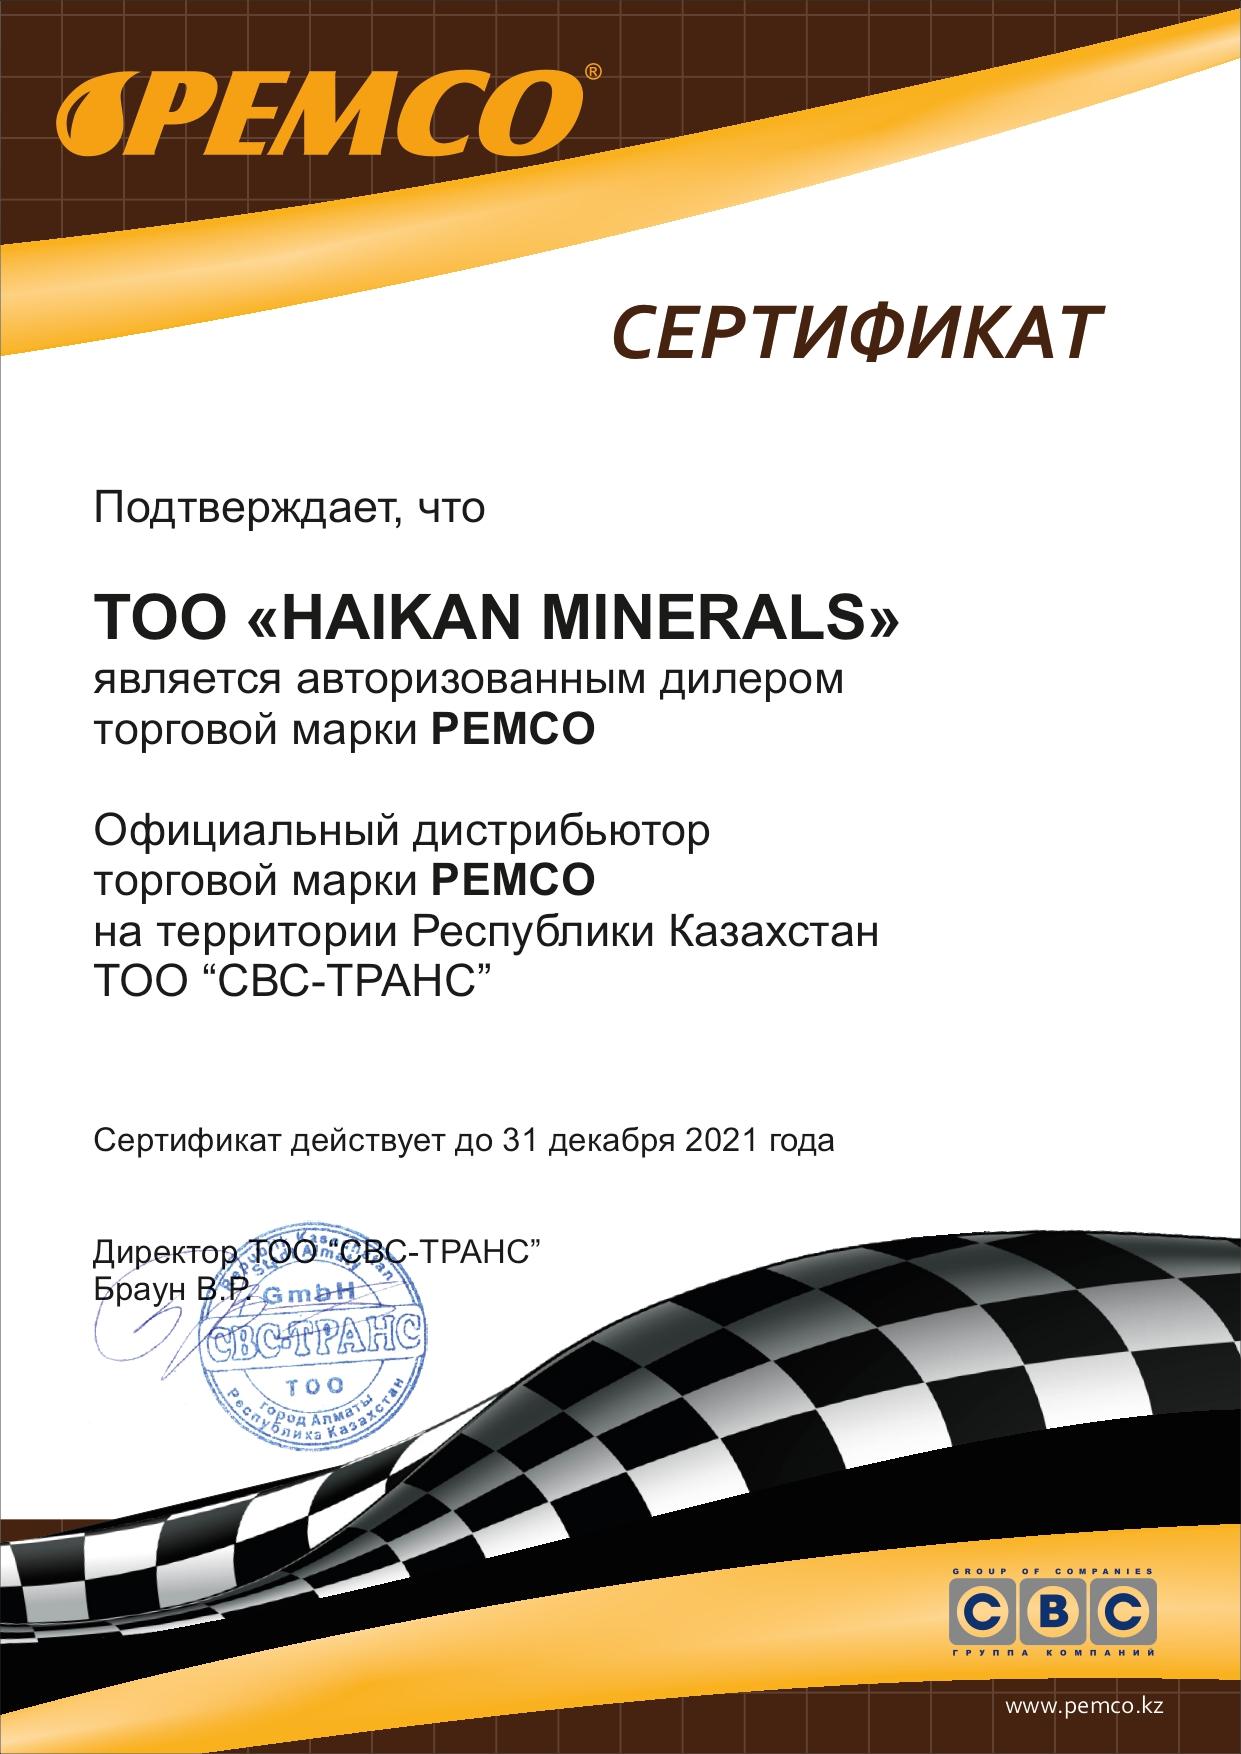 Хайкан Минералс, ТОО